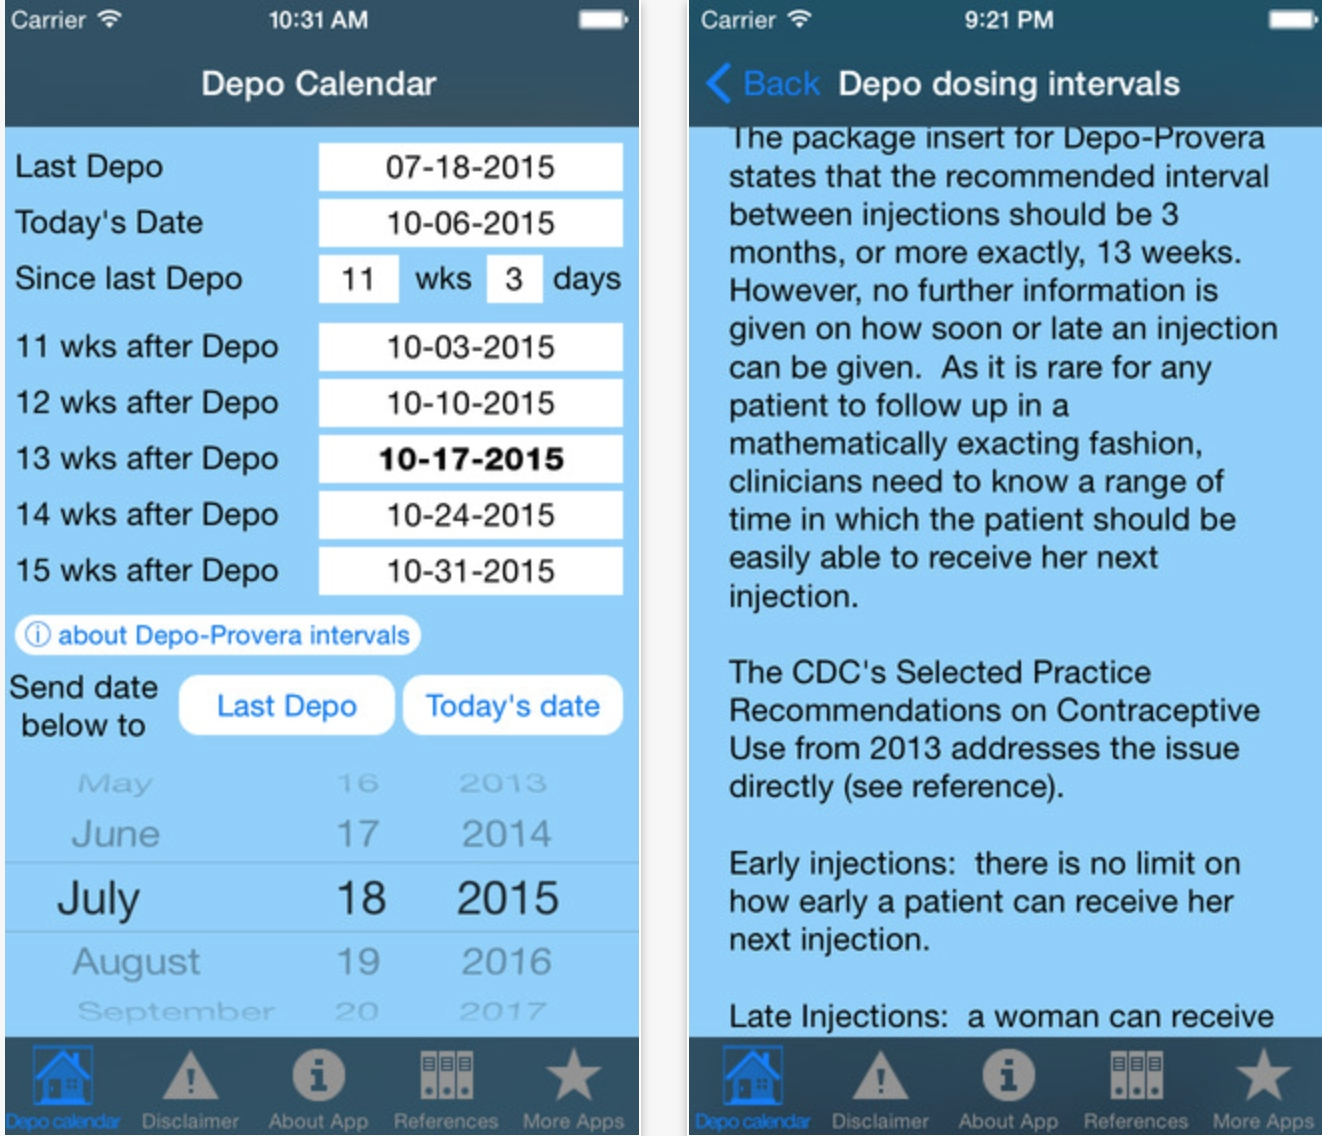 Depo Calendar App Could Significantly Improve Contraception  2020 Depo Provera Dosing Calendar